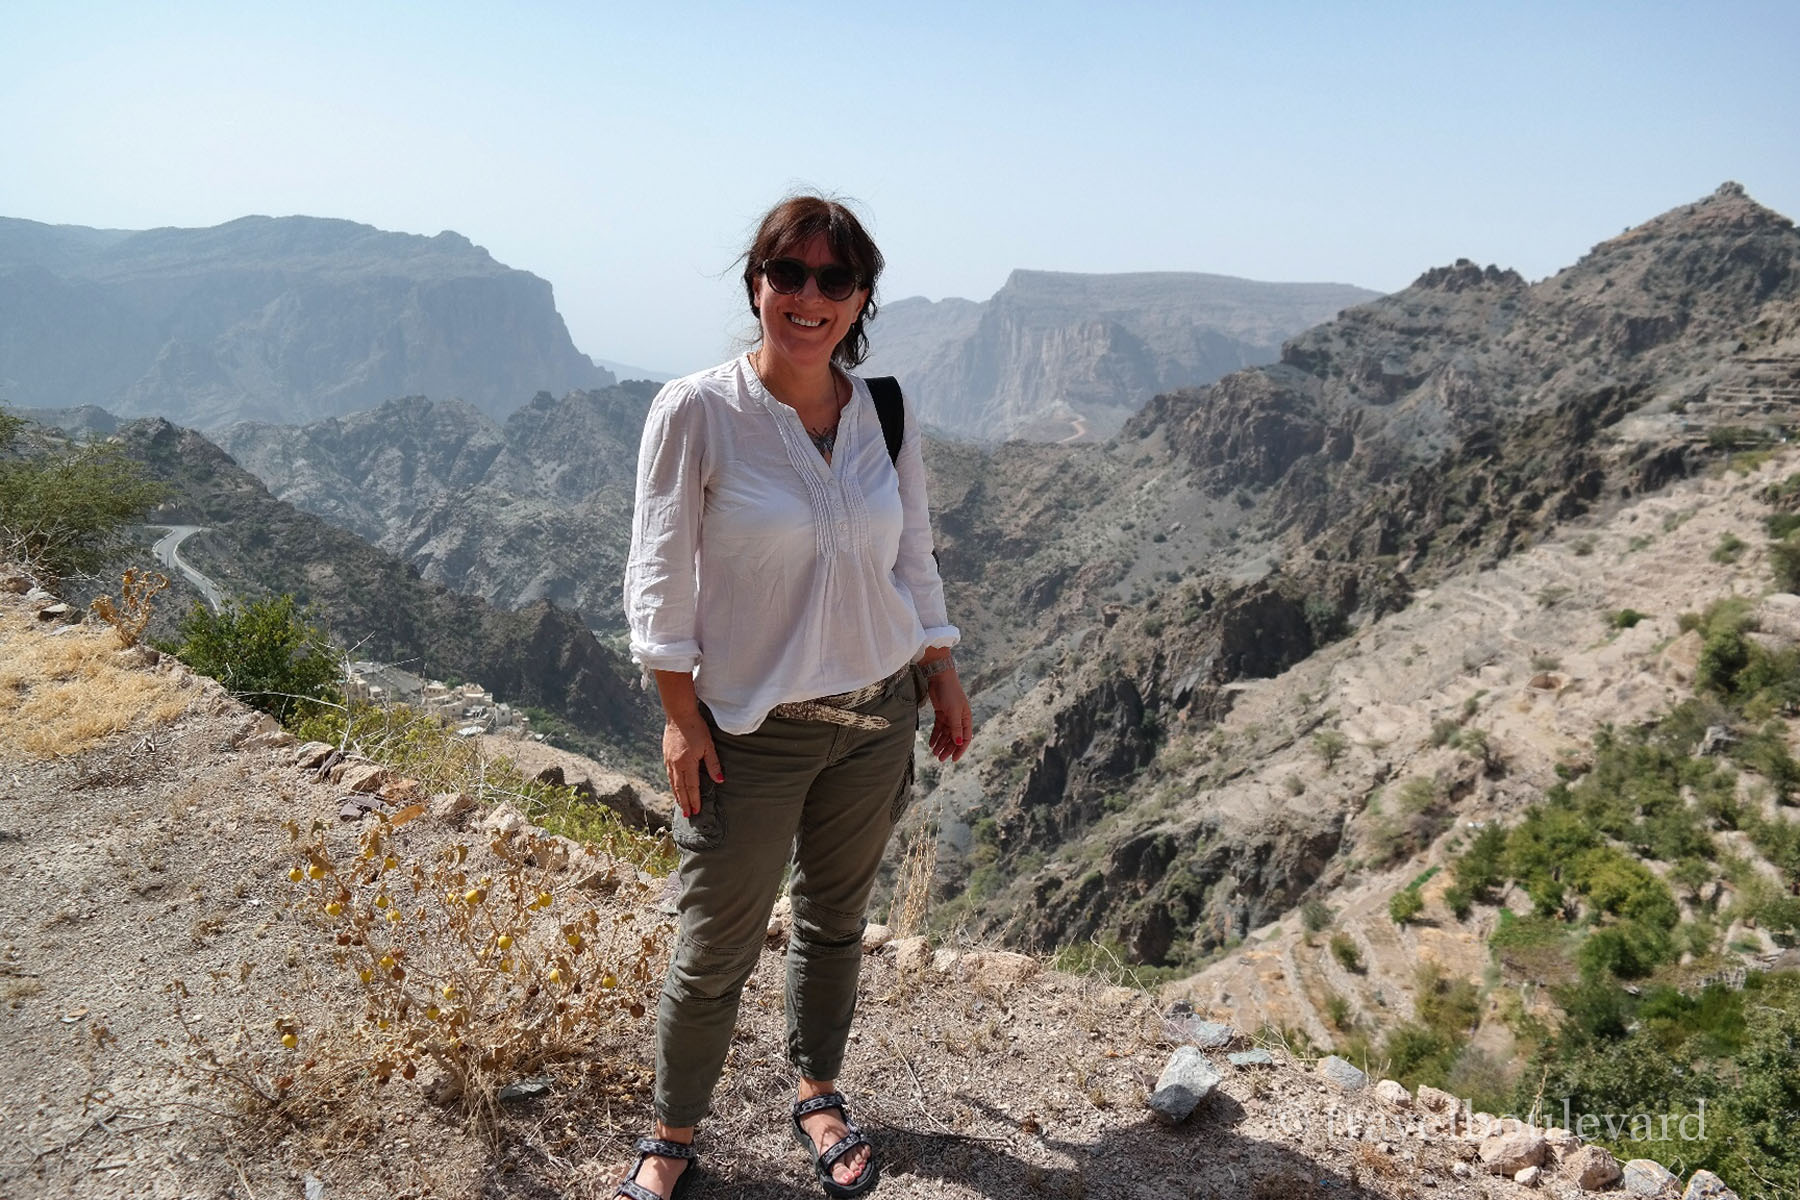 Alila Jabal Akhdar mountains